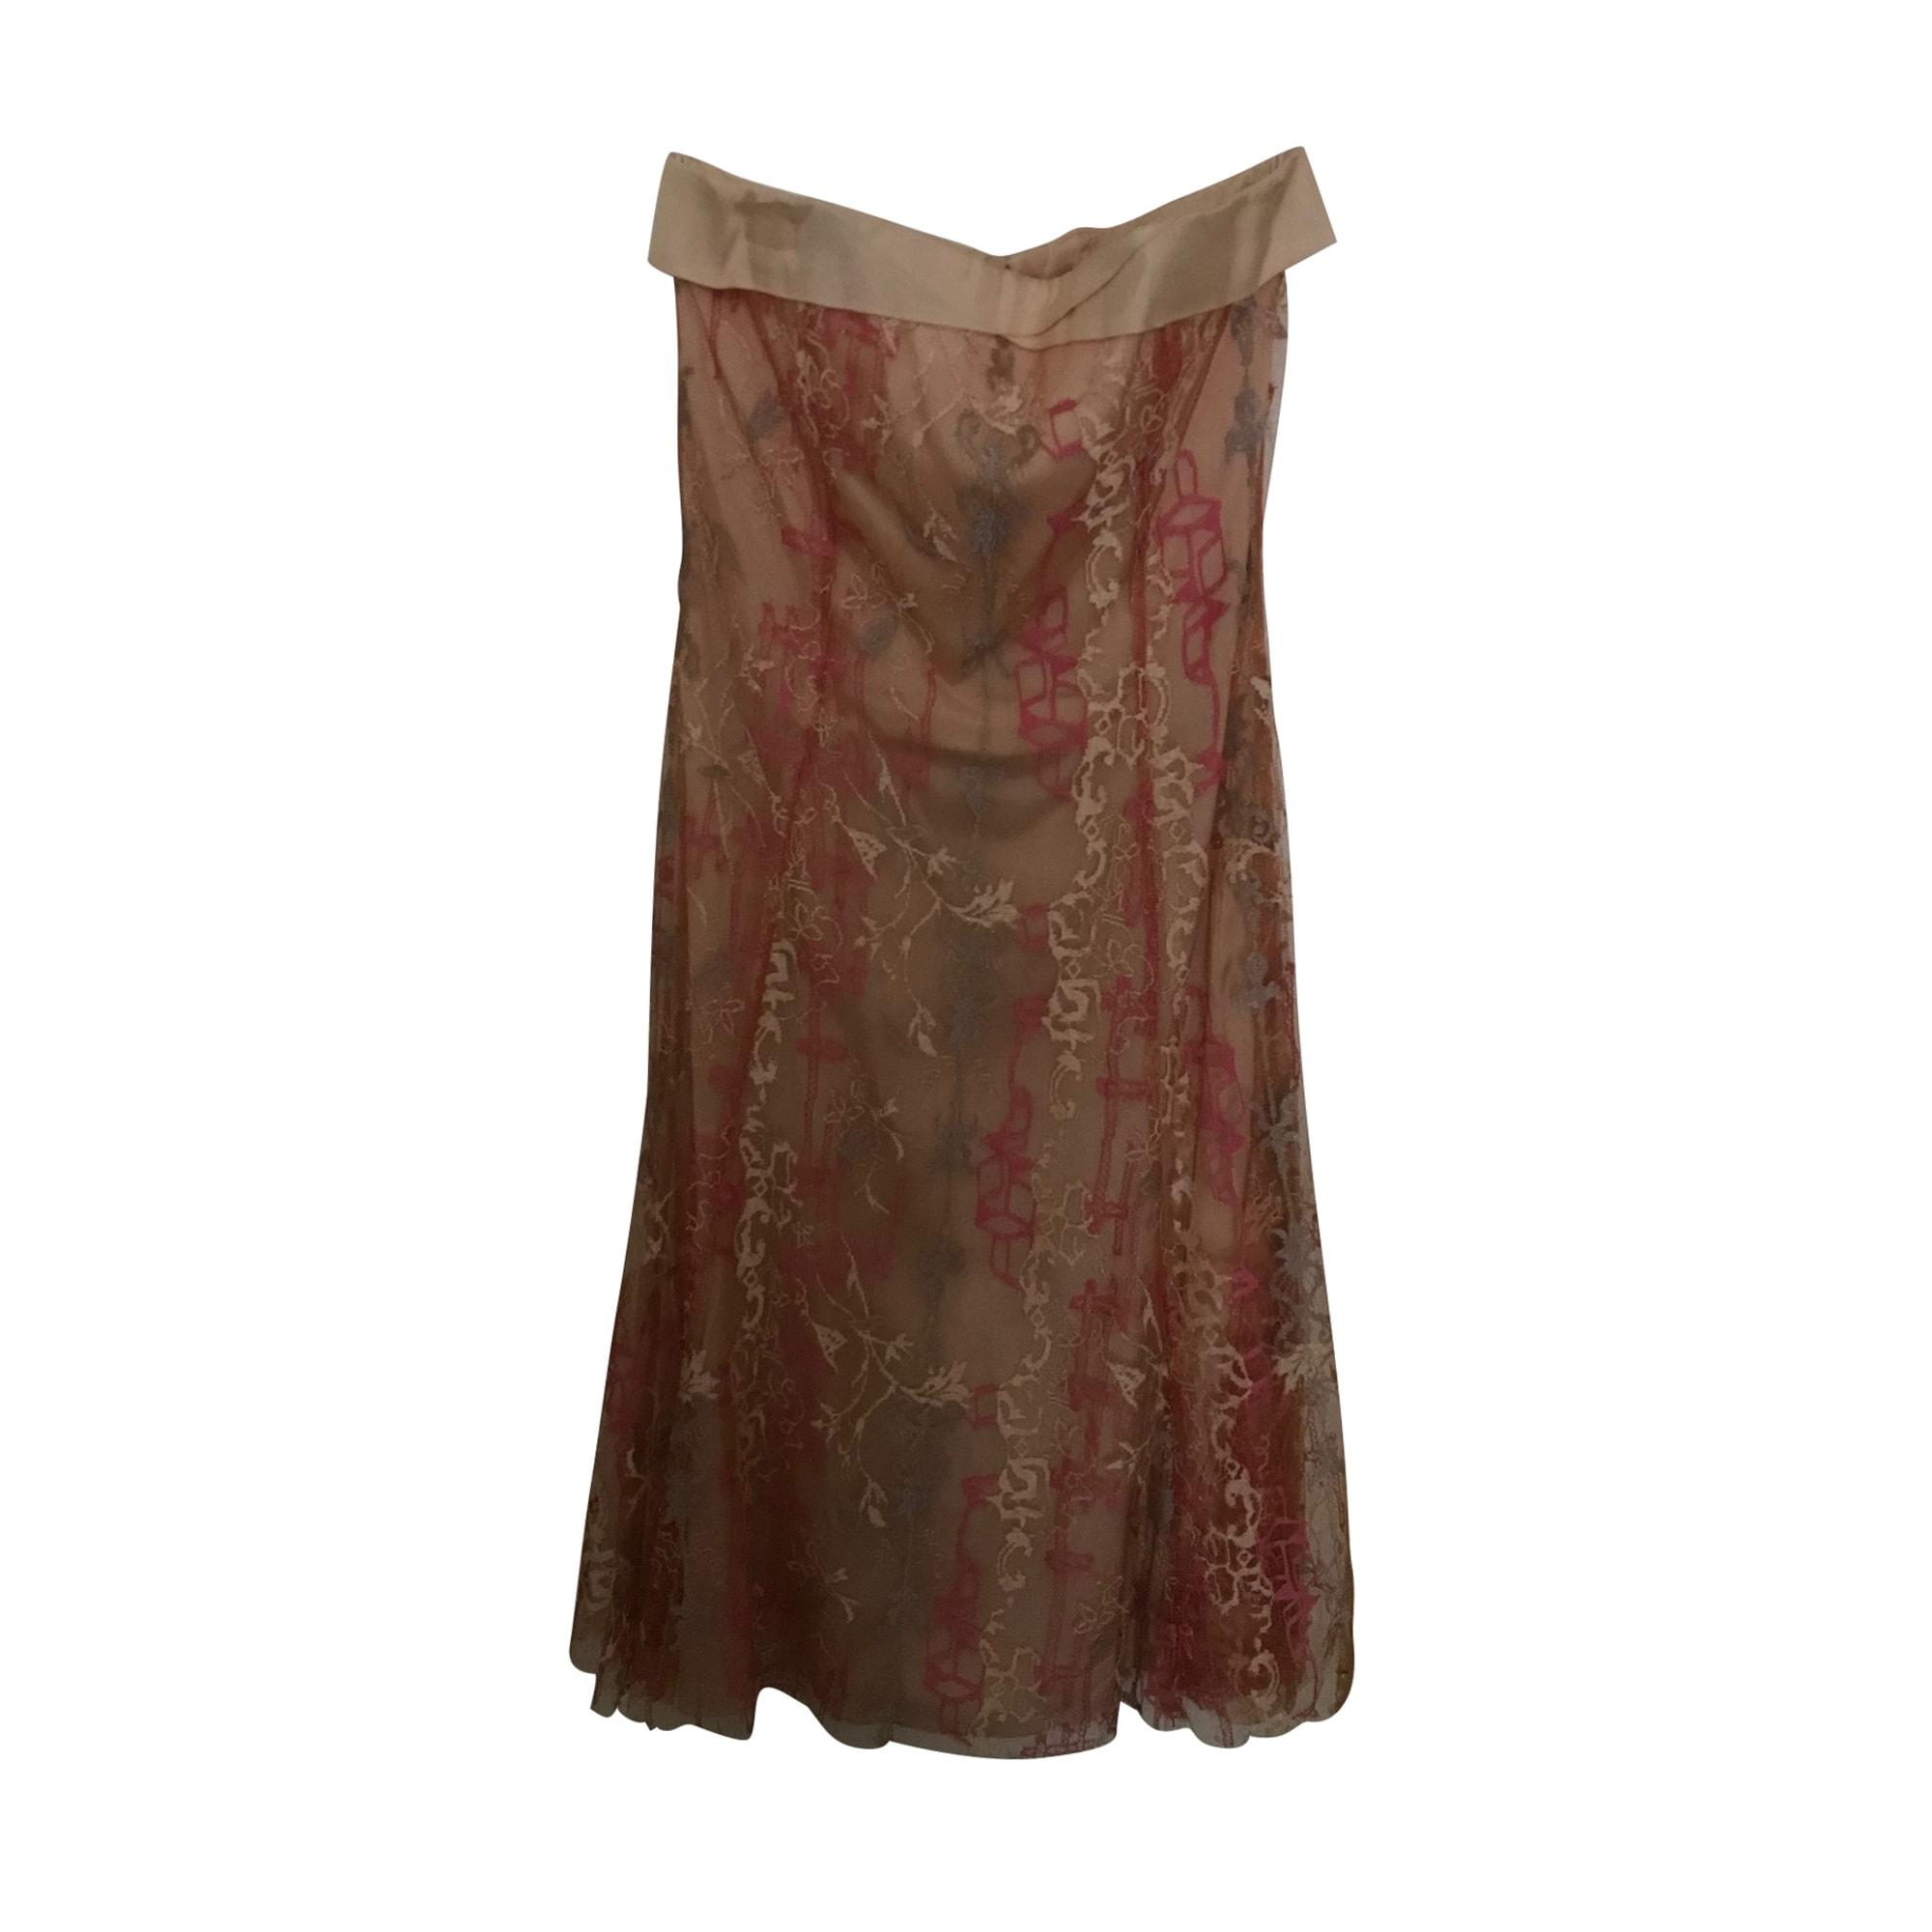 Robe bustier CHRISTIAN LACROIX Rose, fuschia, vieux rose